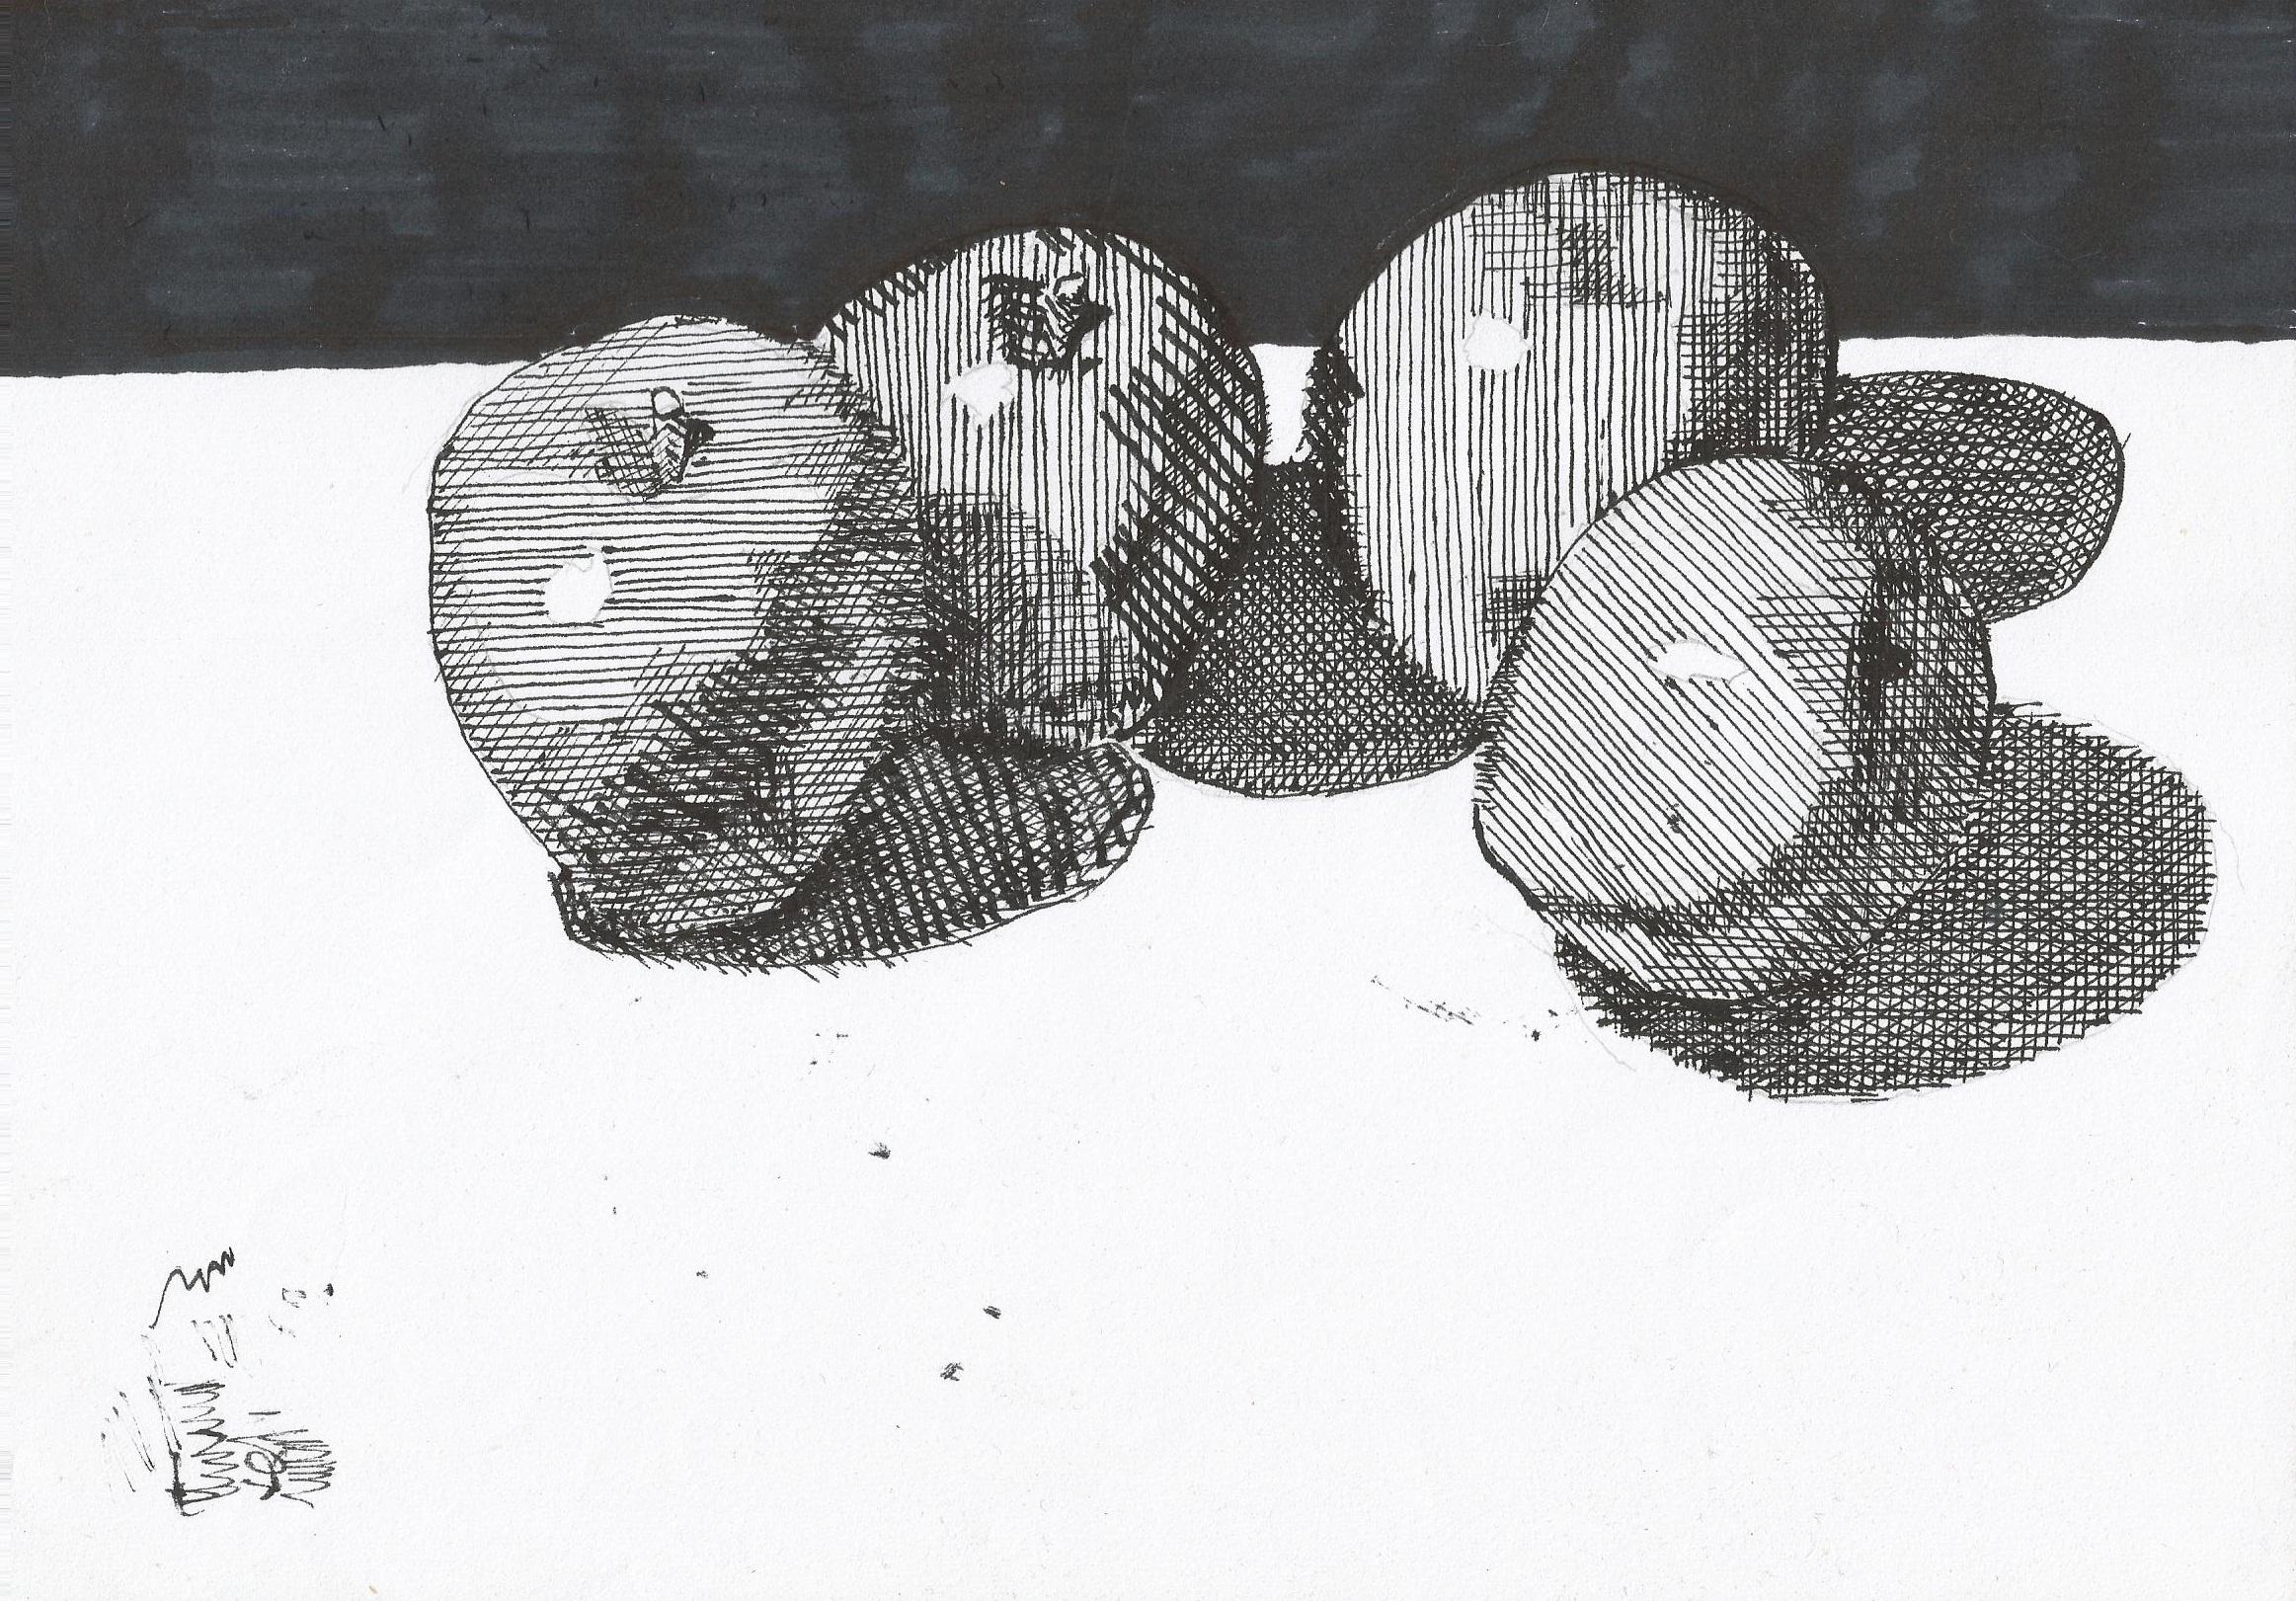 Drawn macbook ink February ink paper) A4 2013